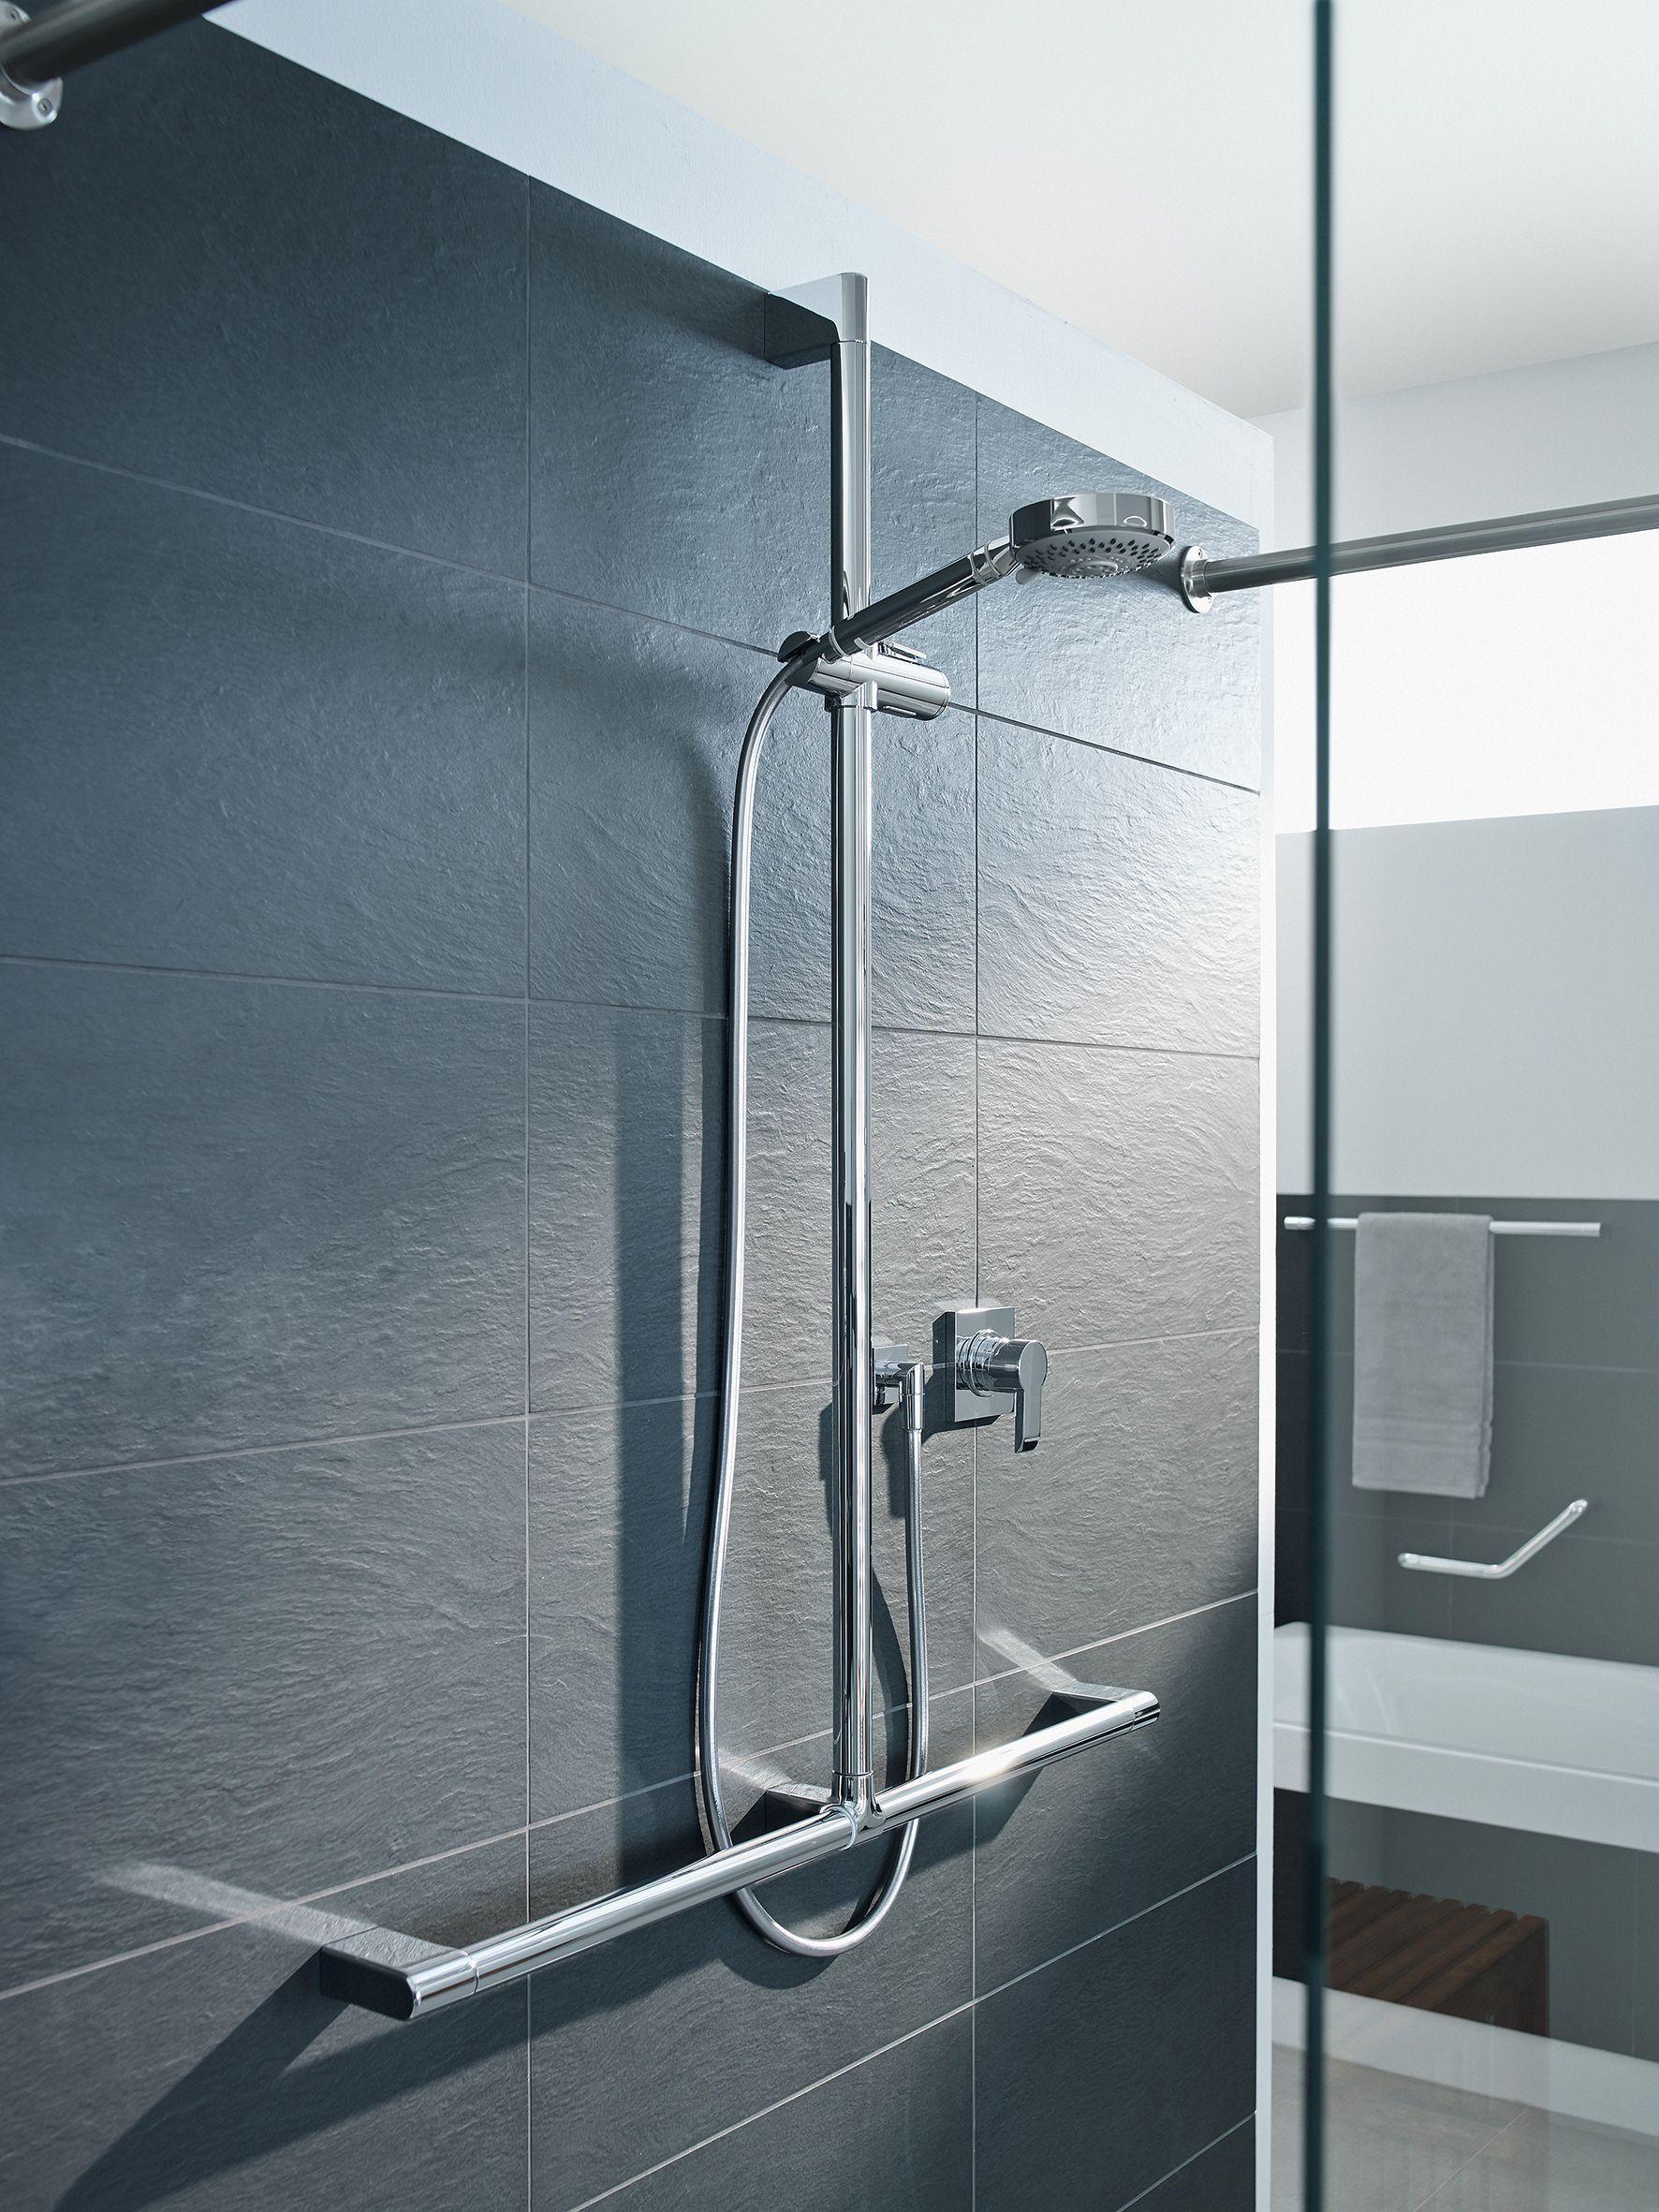 Shower Slide Rail With Grab Bar Luxury Disabled Bathrooms Luxurydisabledbathrooms Luxurybathroo Bathroom Grab Rails Grab Bars In Bathroom Disabled Bathroom